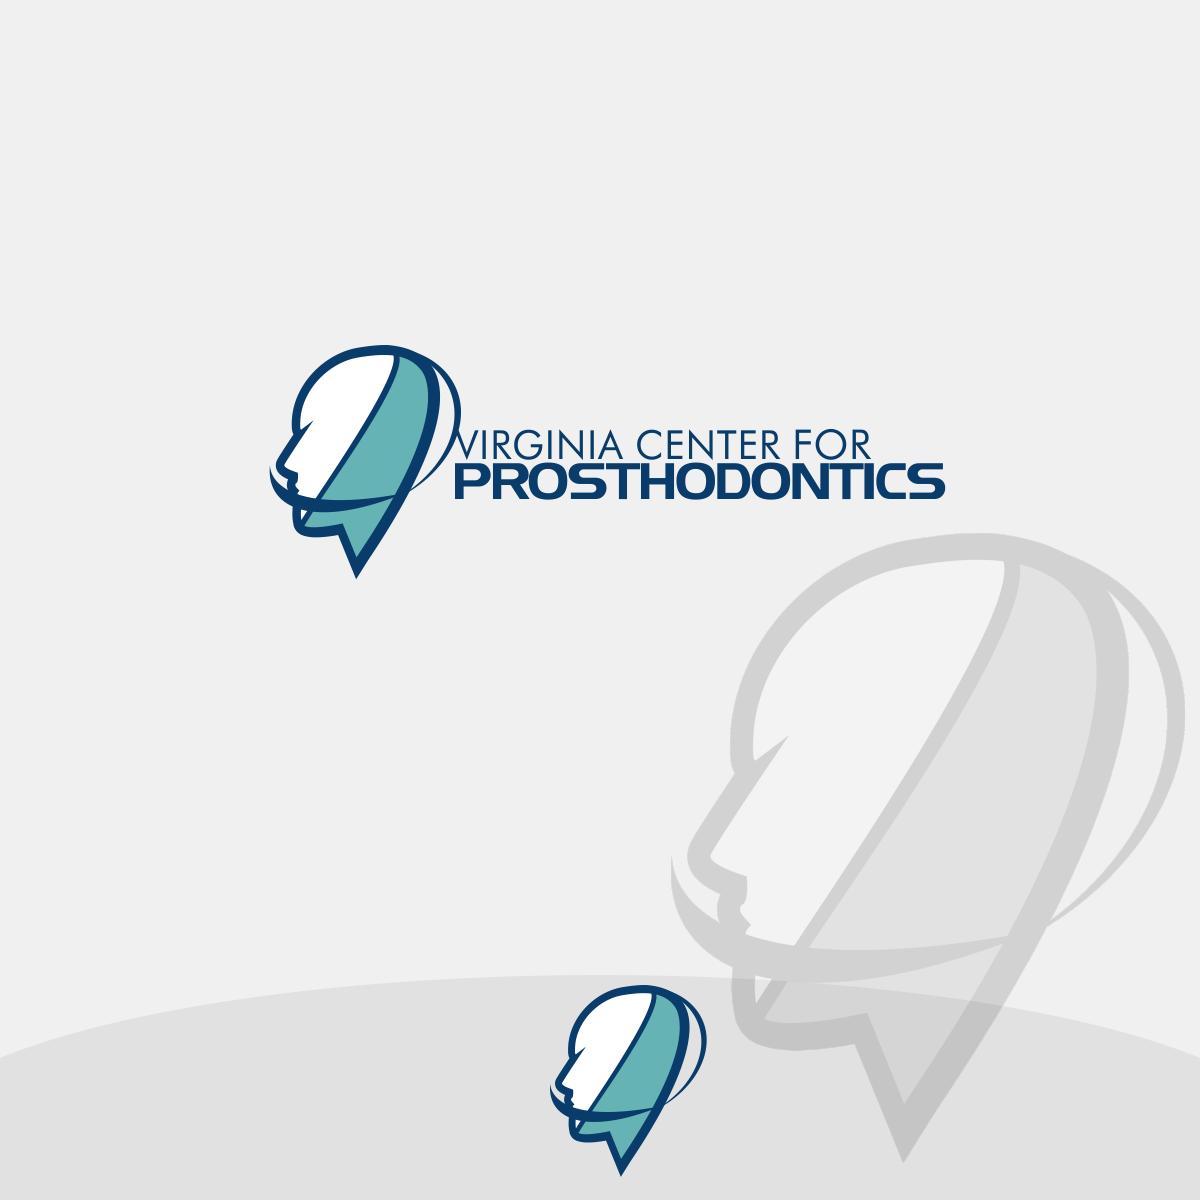 Logo Design by Private User - Entry No. 64 in the Logo Design Contest Imaginative Logo Design for Virginia Center for Prosthodontics.